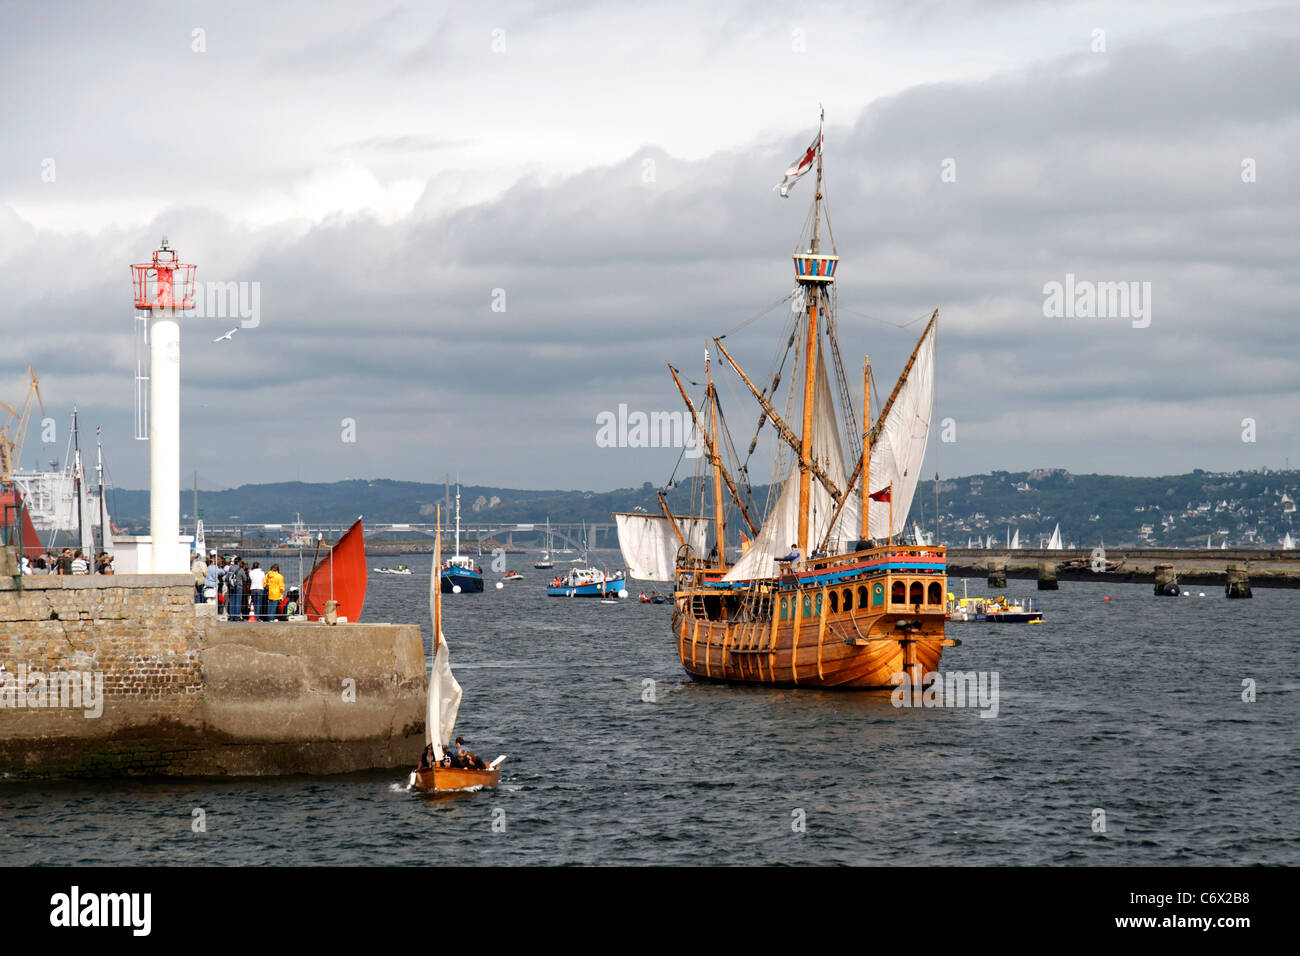 Matthew : caravel, replica (Bristol, UK), Brest maritime festival (Finistère, Brittany, France). - Stock Image